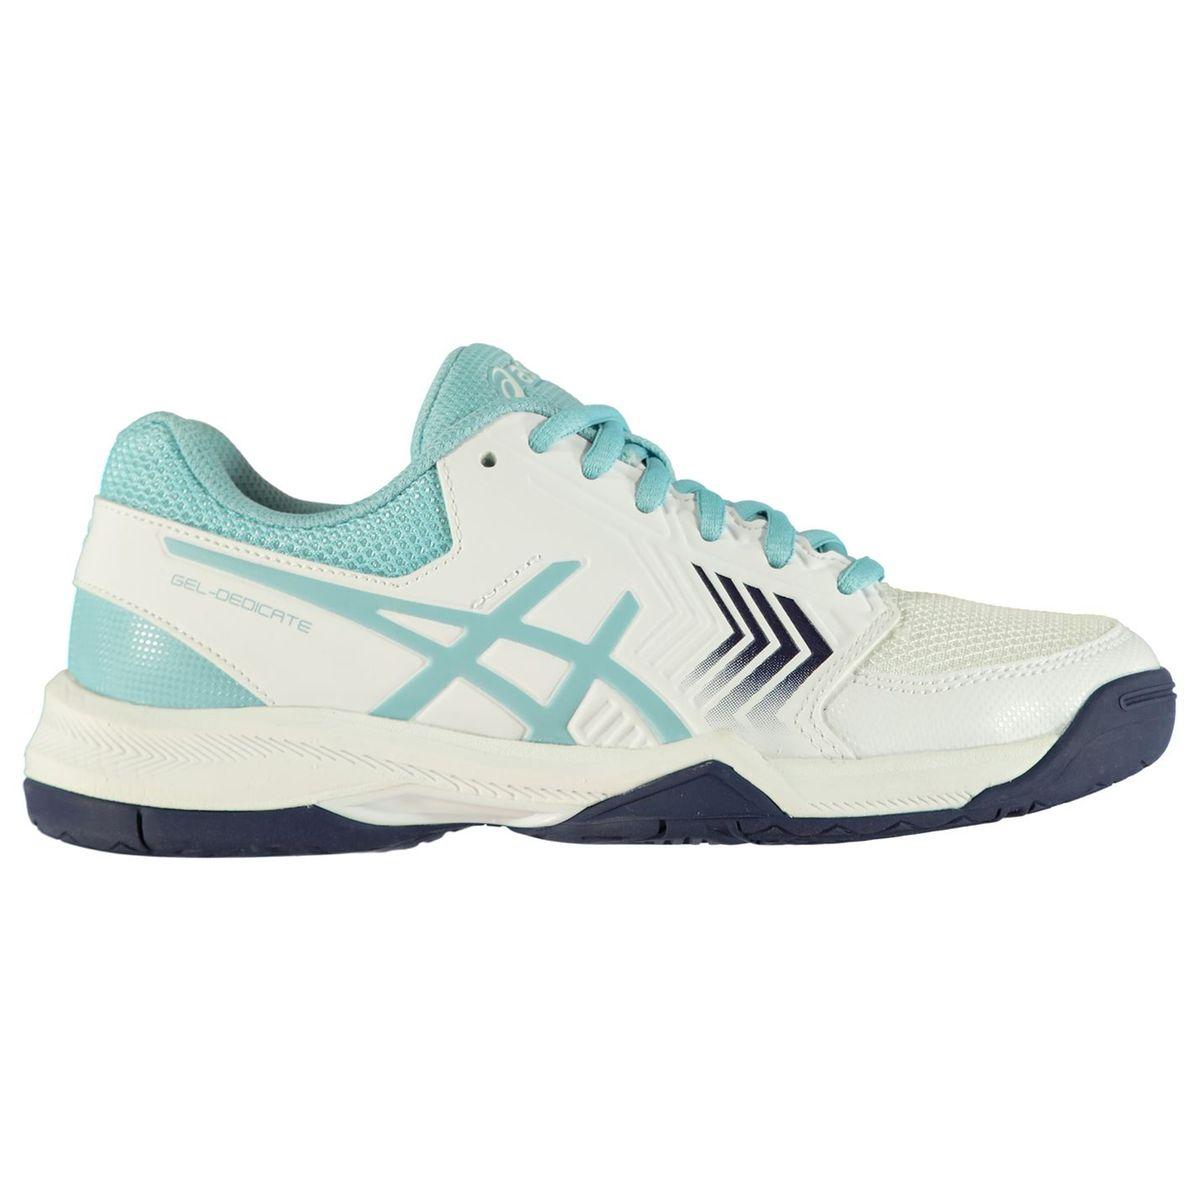 Chaussures De Tennis Gel dedicate 5 Taille : 3940